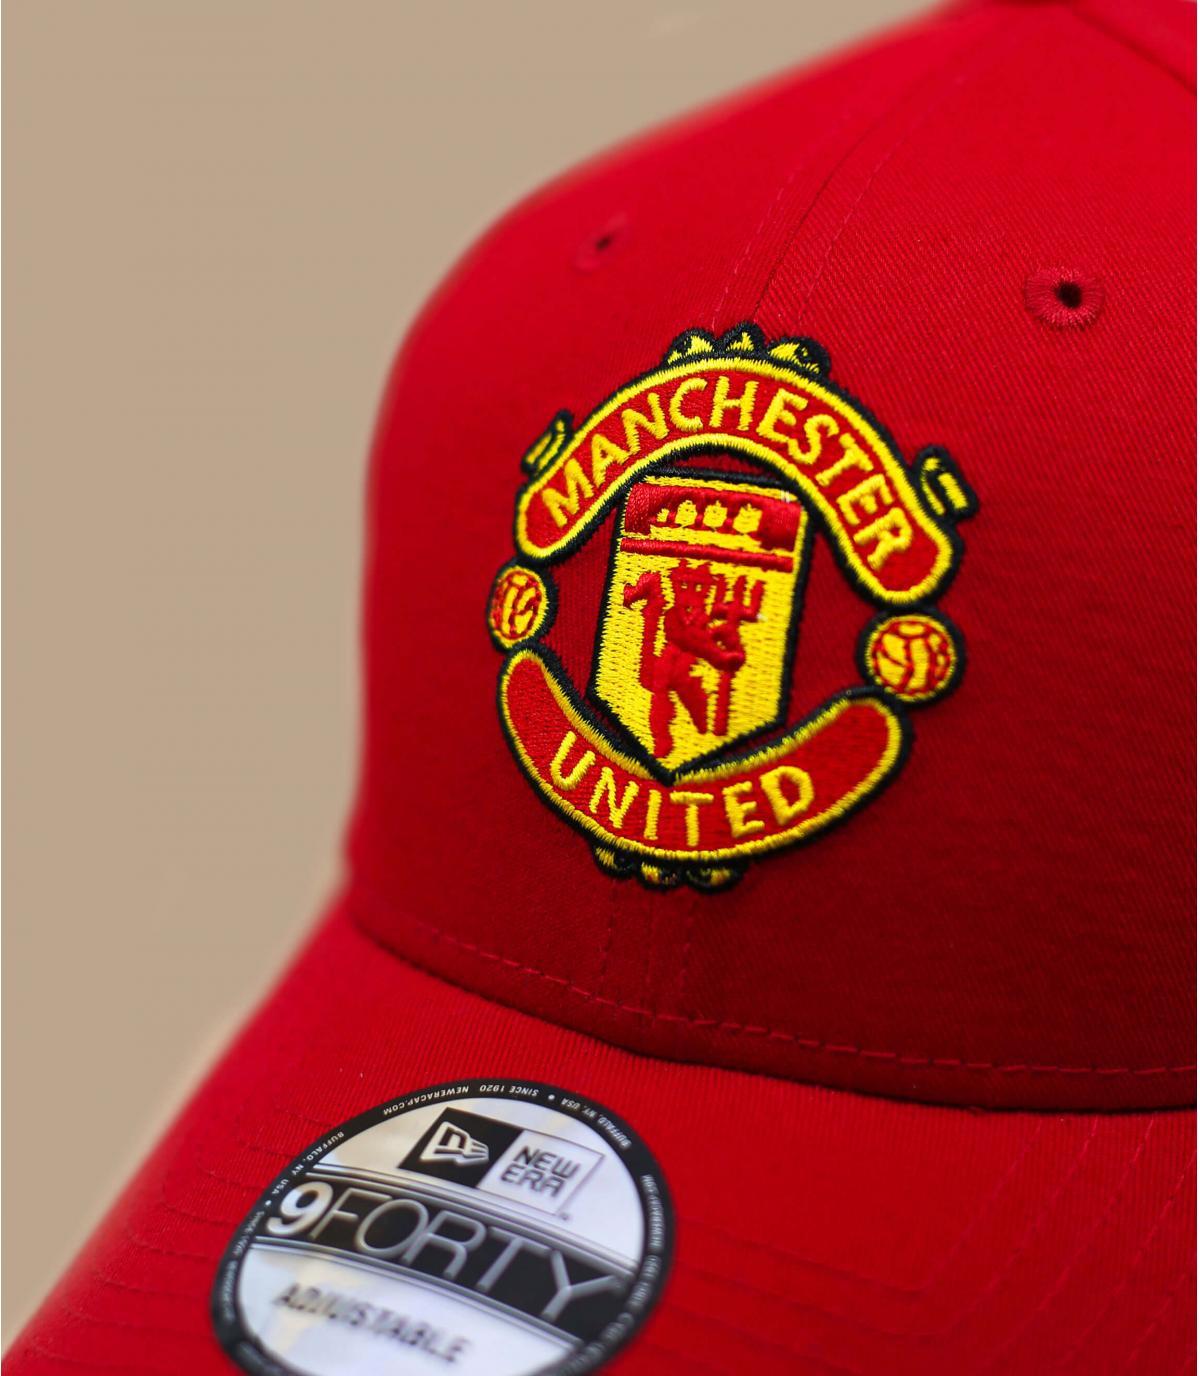 Red Manchester United cap - Cap Manchester United red by New Era ... 9e9a1b974f8